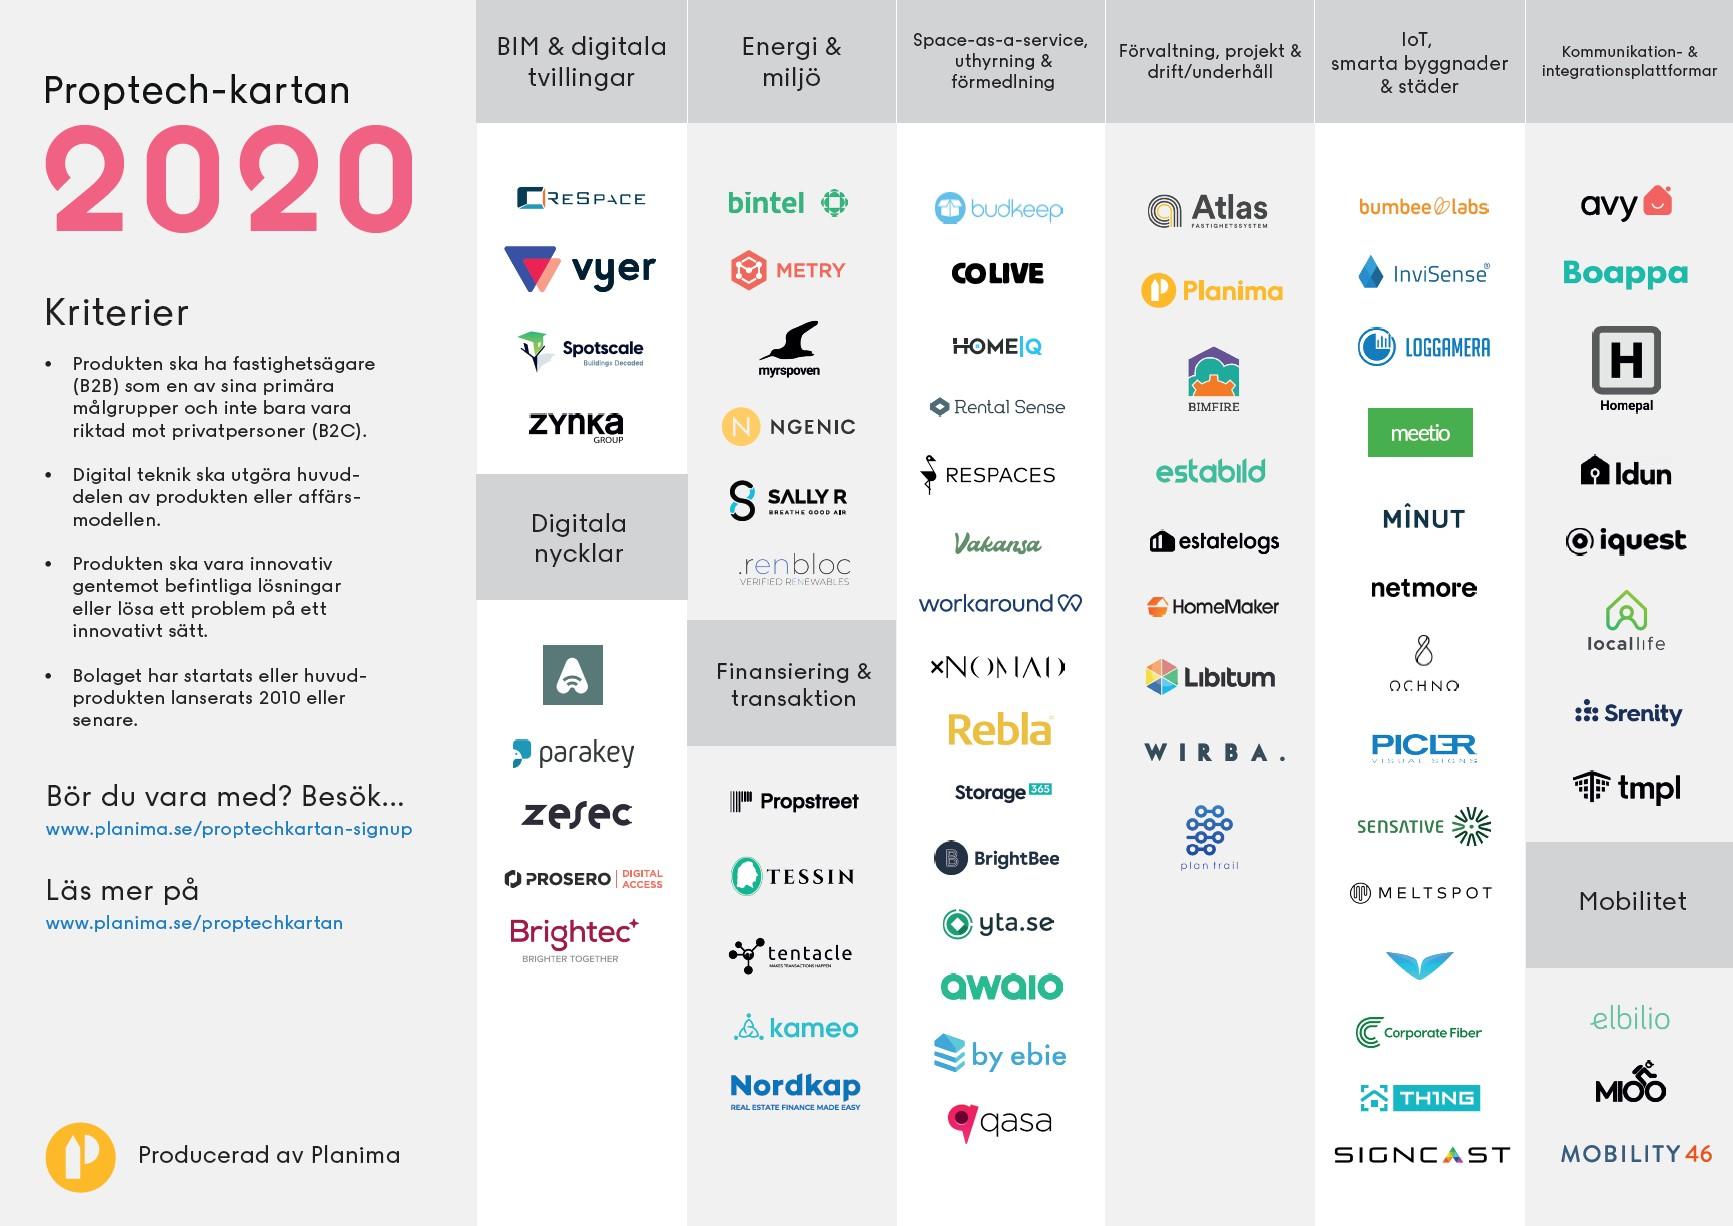 Proptech-kartan: Planimas översikt över alla proptech-startups i Sverige.